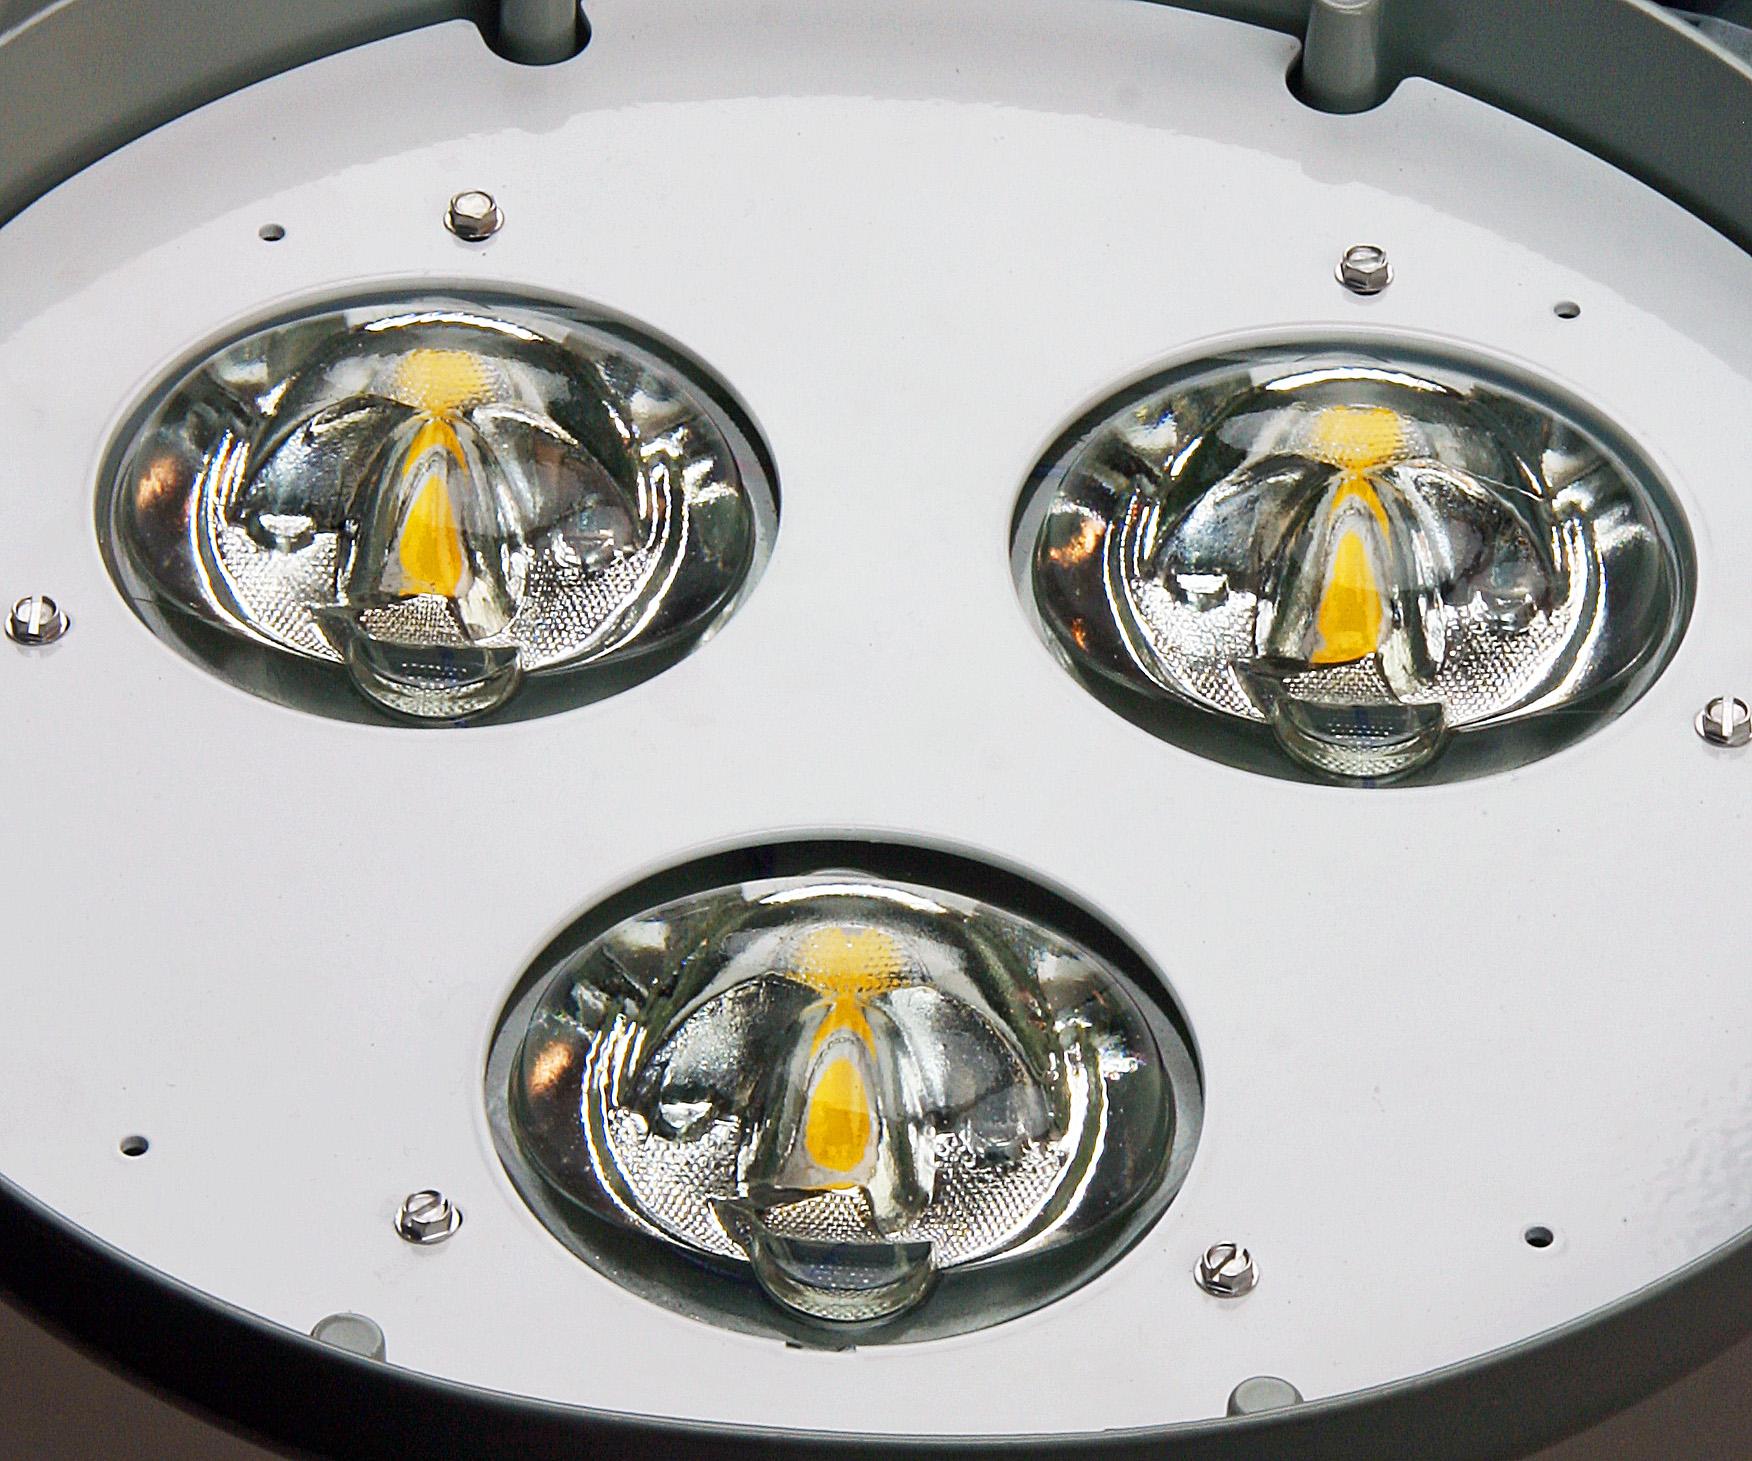 Autobahn ATBM LED Roadway Luminaire